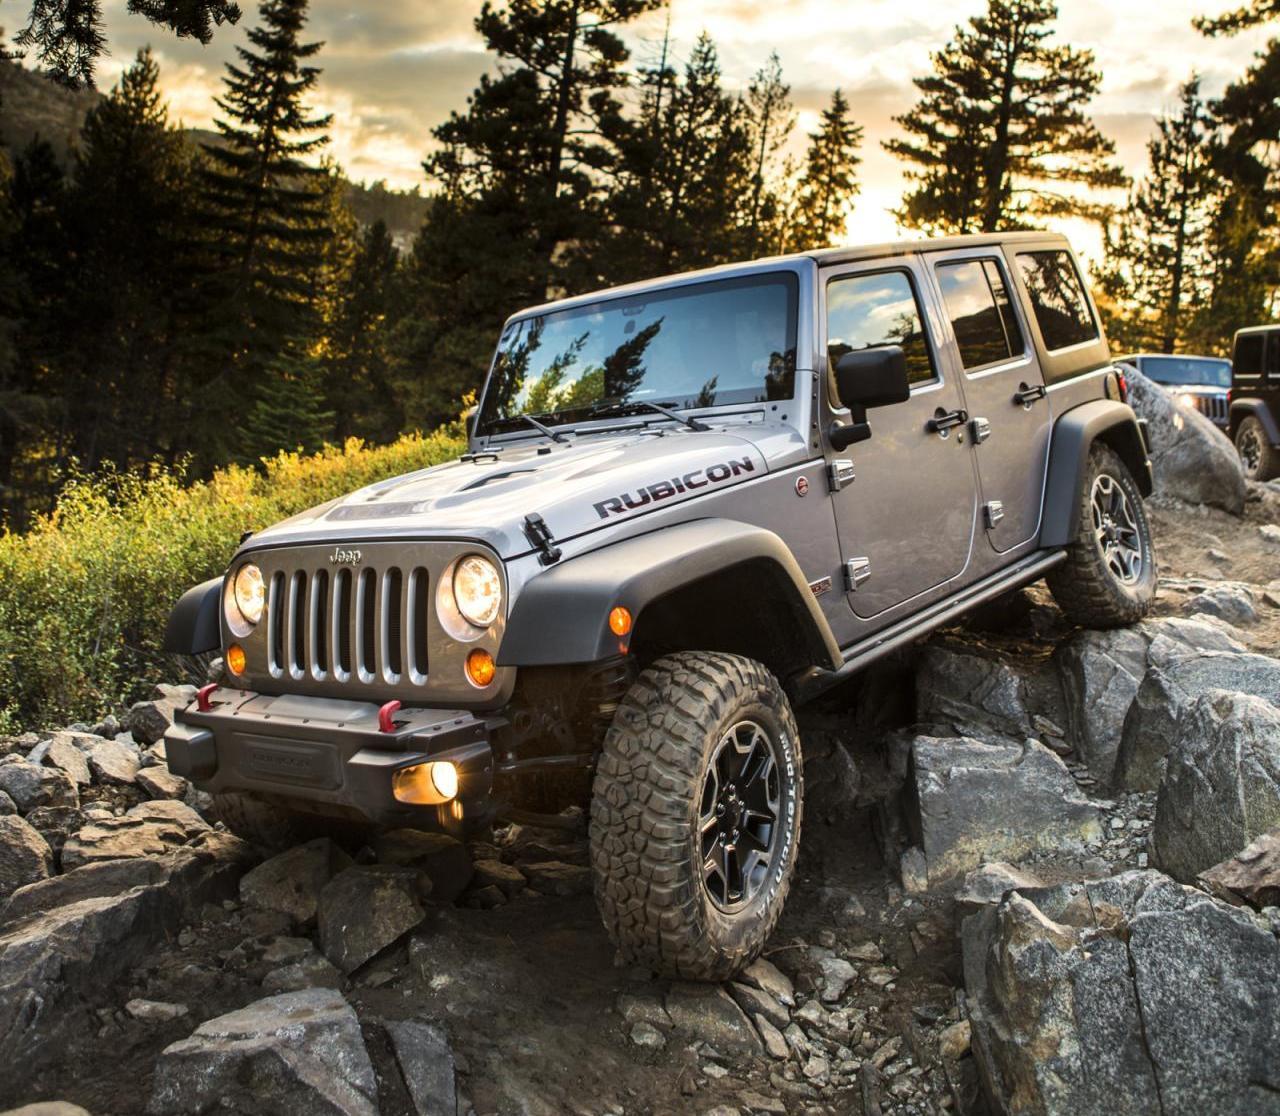 Jeep+Wrangler+Rubicon+10th+Anniversary+1.jpg